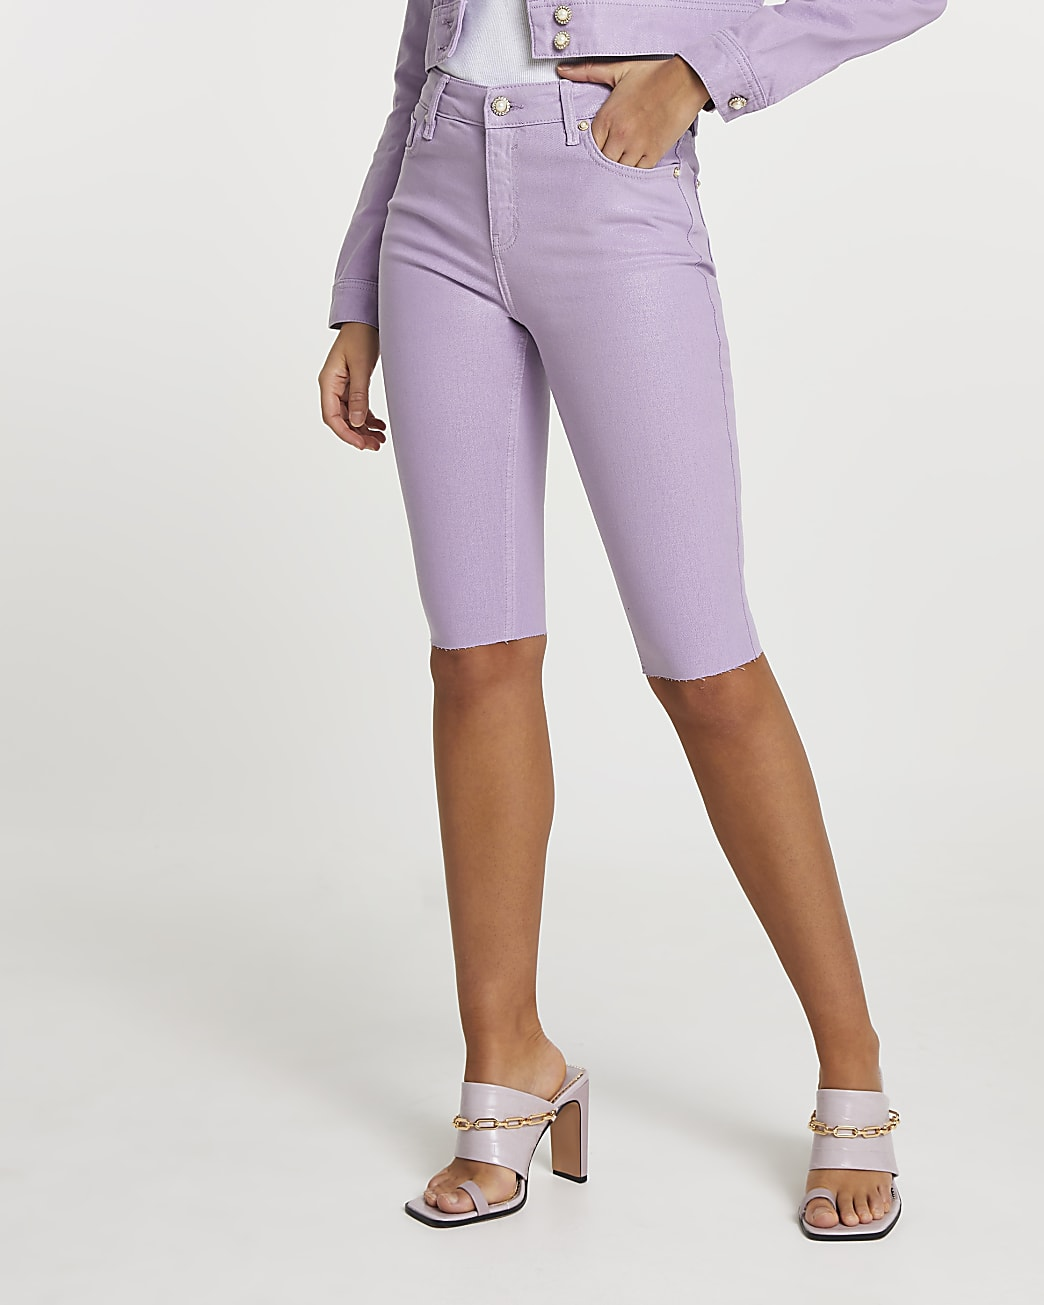 Purple denim cycling shorts